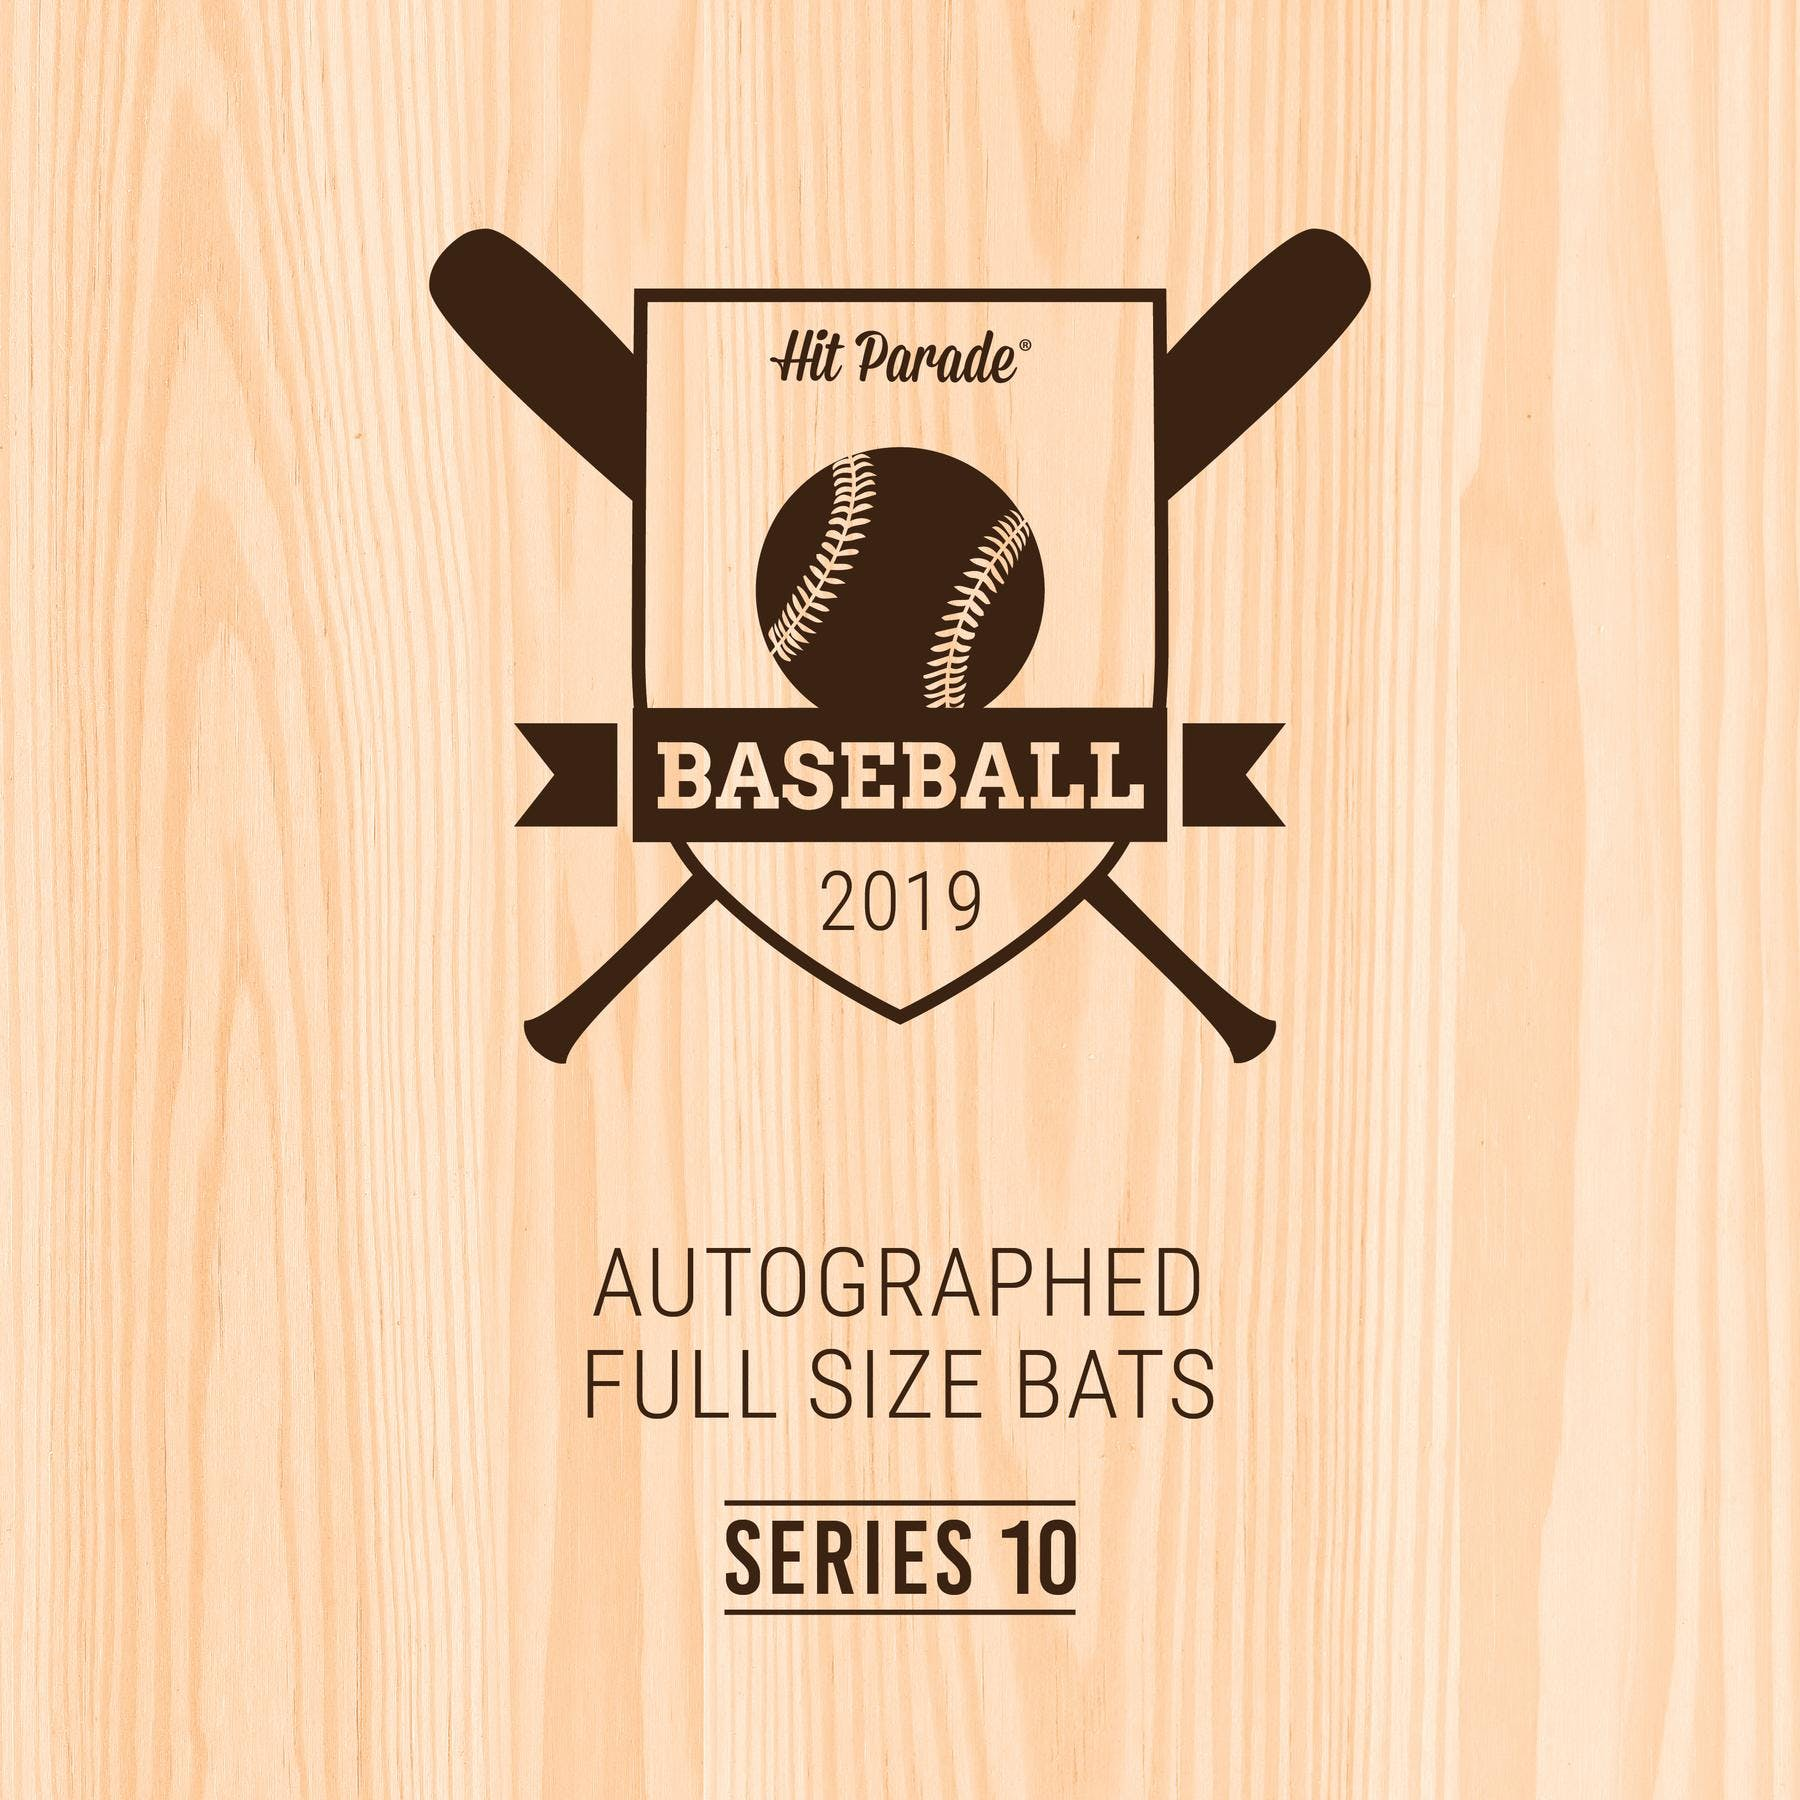 2019 Hit Parade Autographed Baseball Bat Hobby Box - Series 10 - Derek  Jeter & Peter Alonso!!